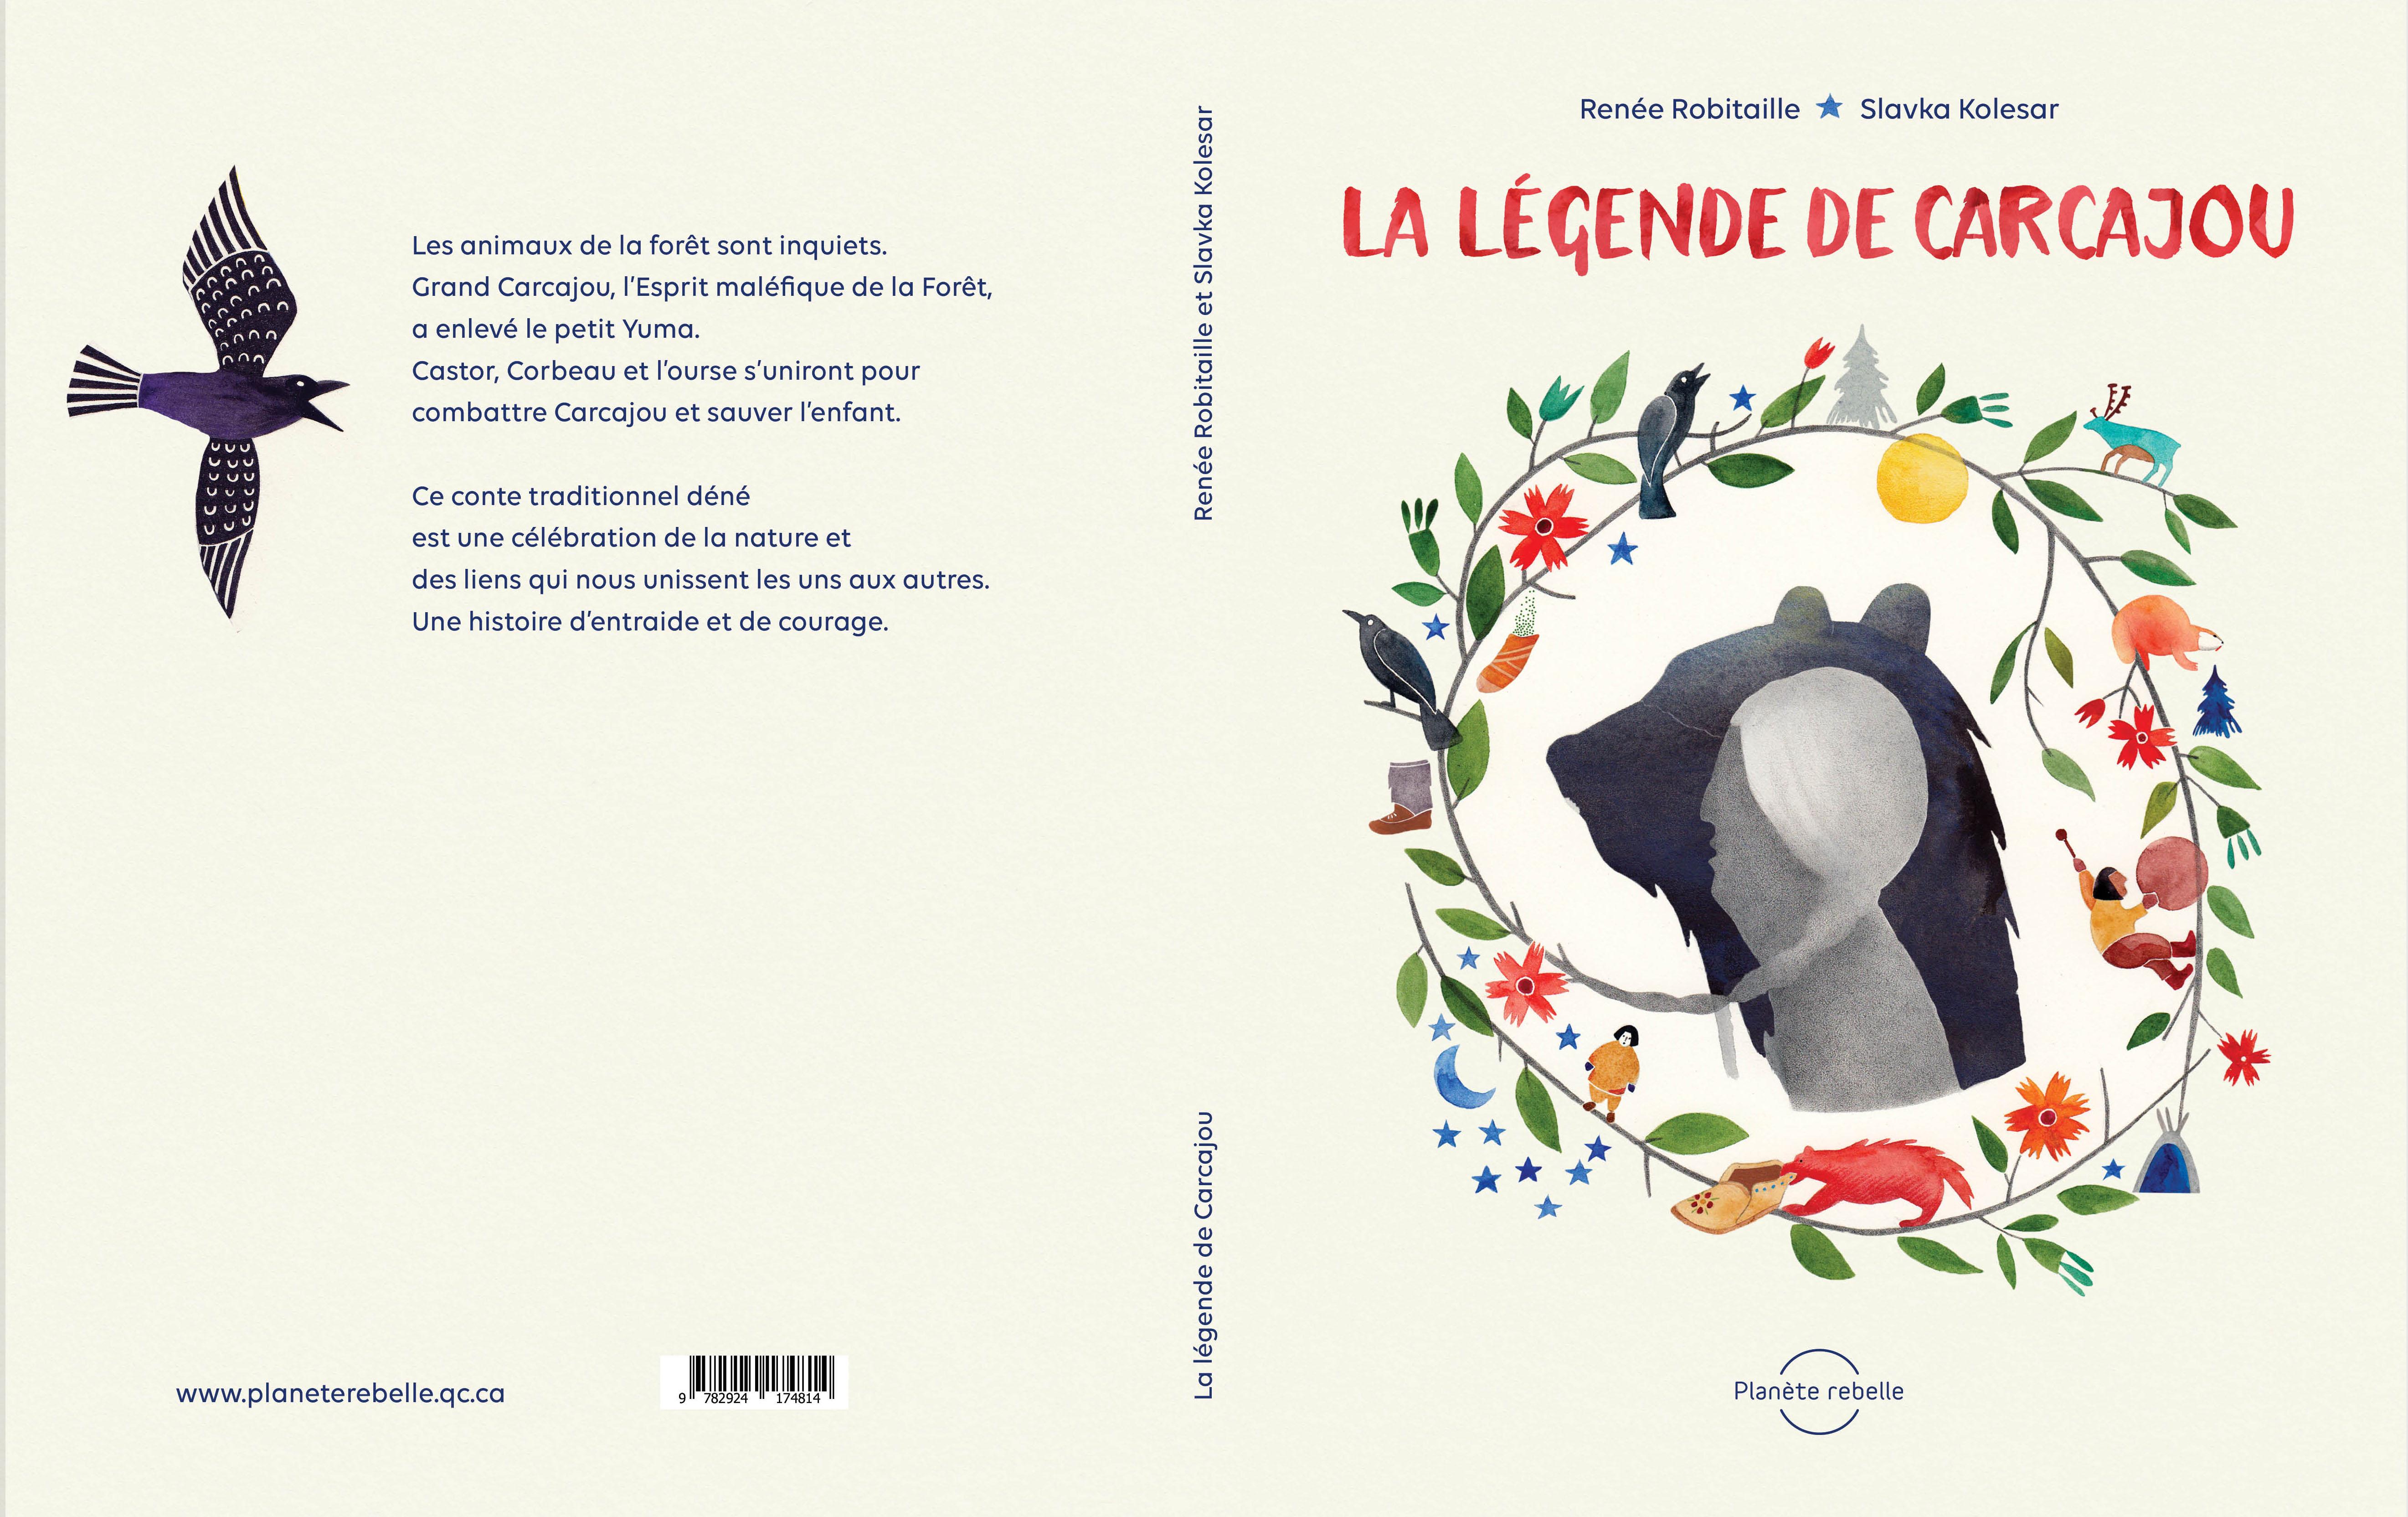 carcajou_c1c4